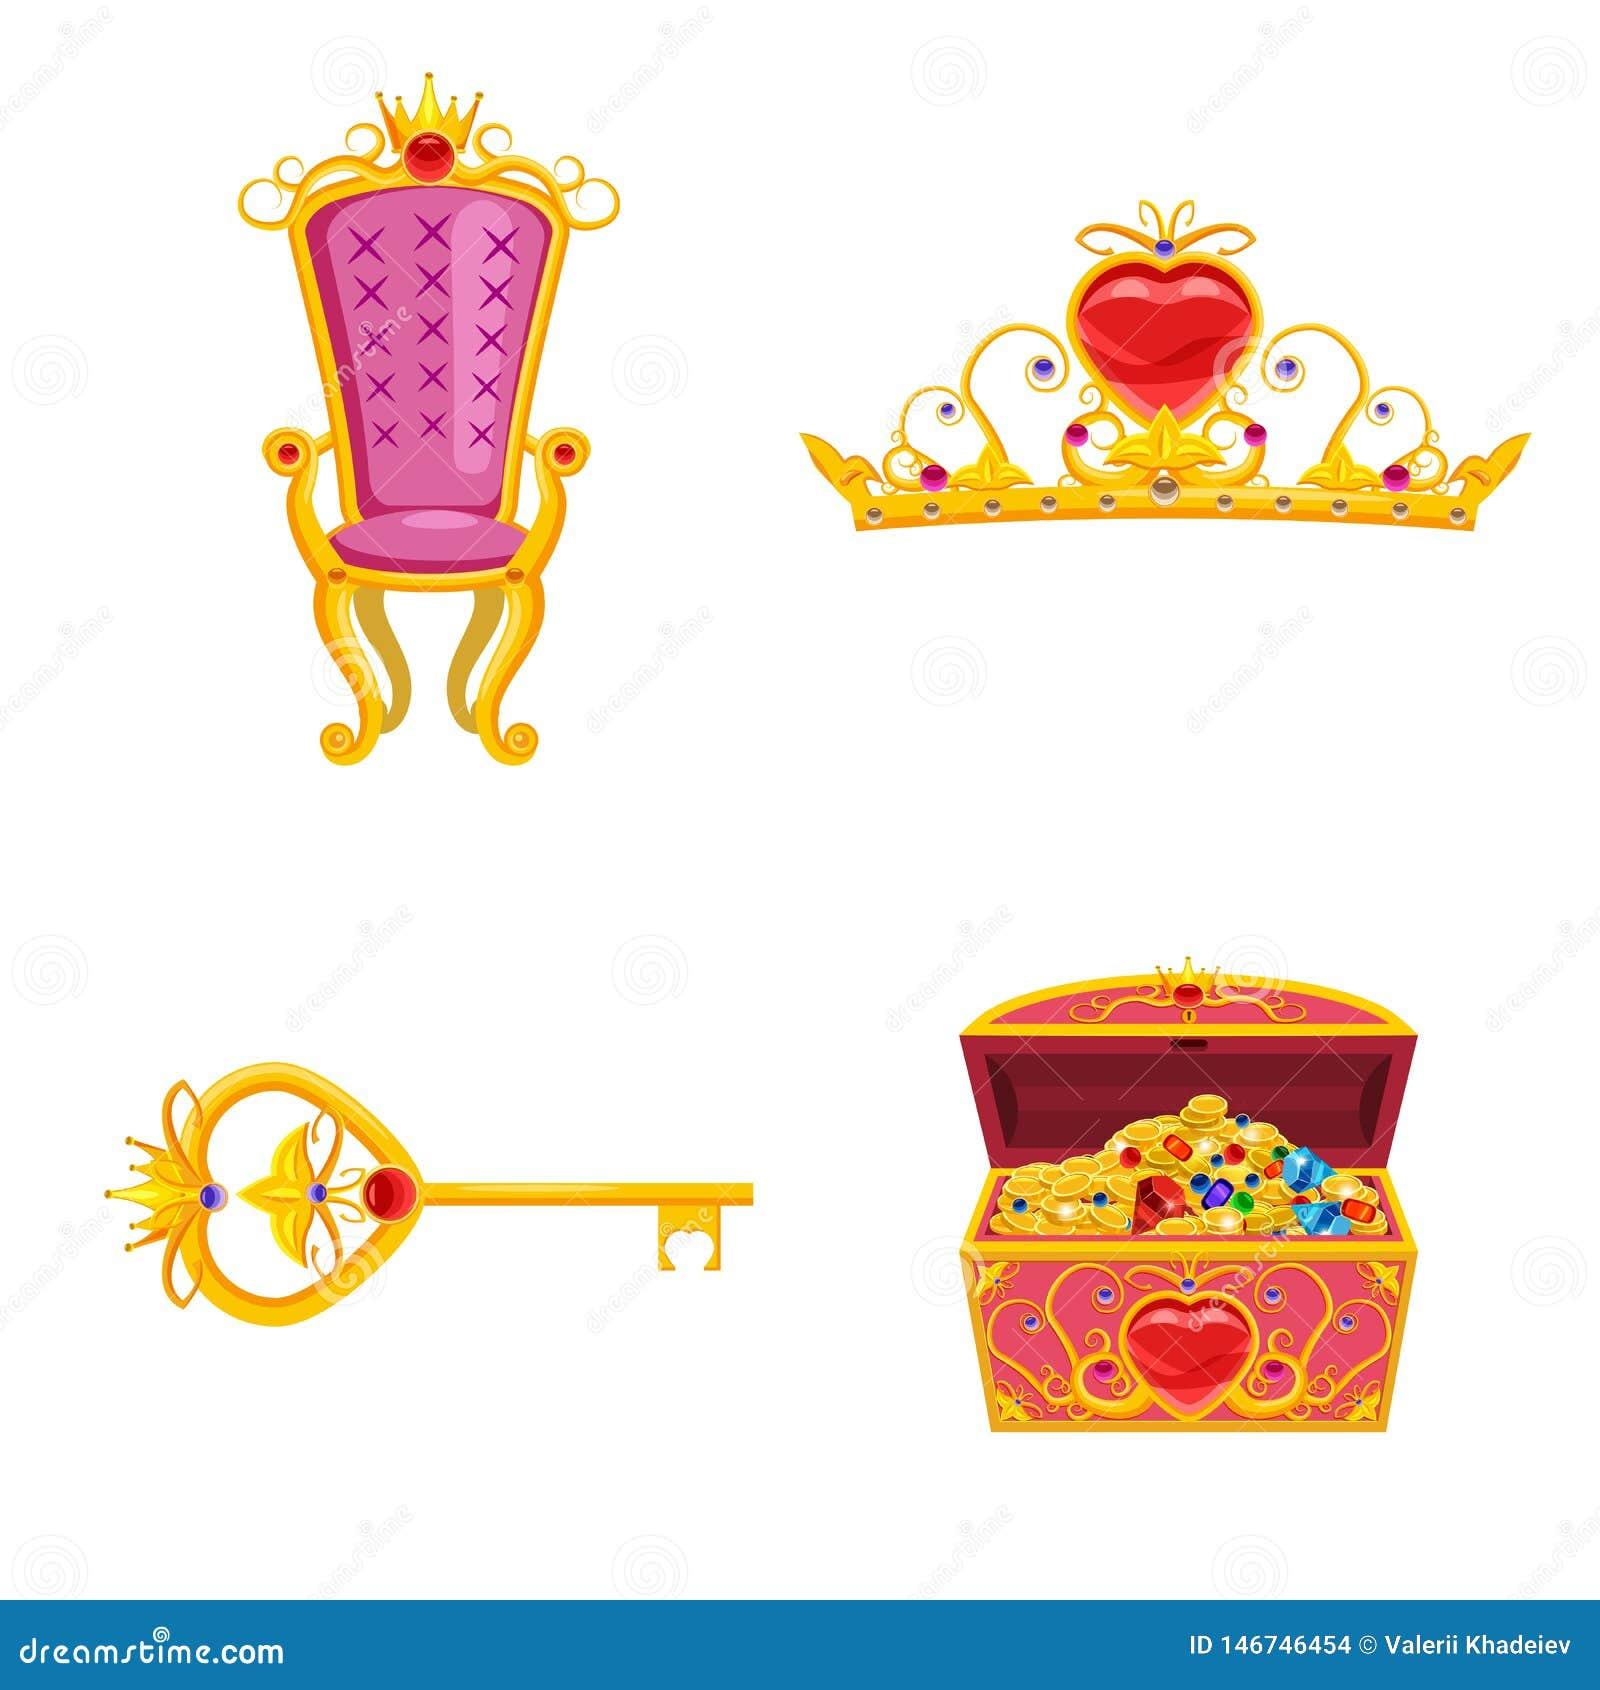 Set Fairy World elements and attributes of design. Treasure chest, tiara, key, throne. Vector, illustration, cartoon